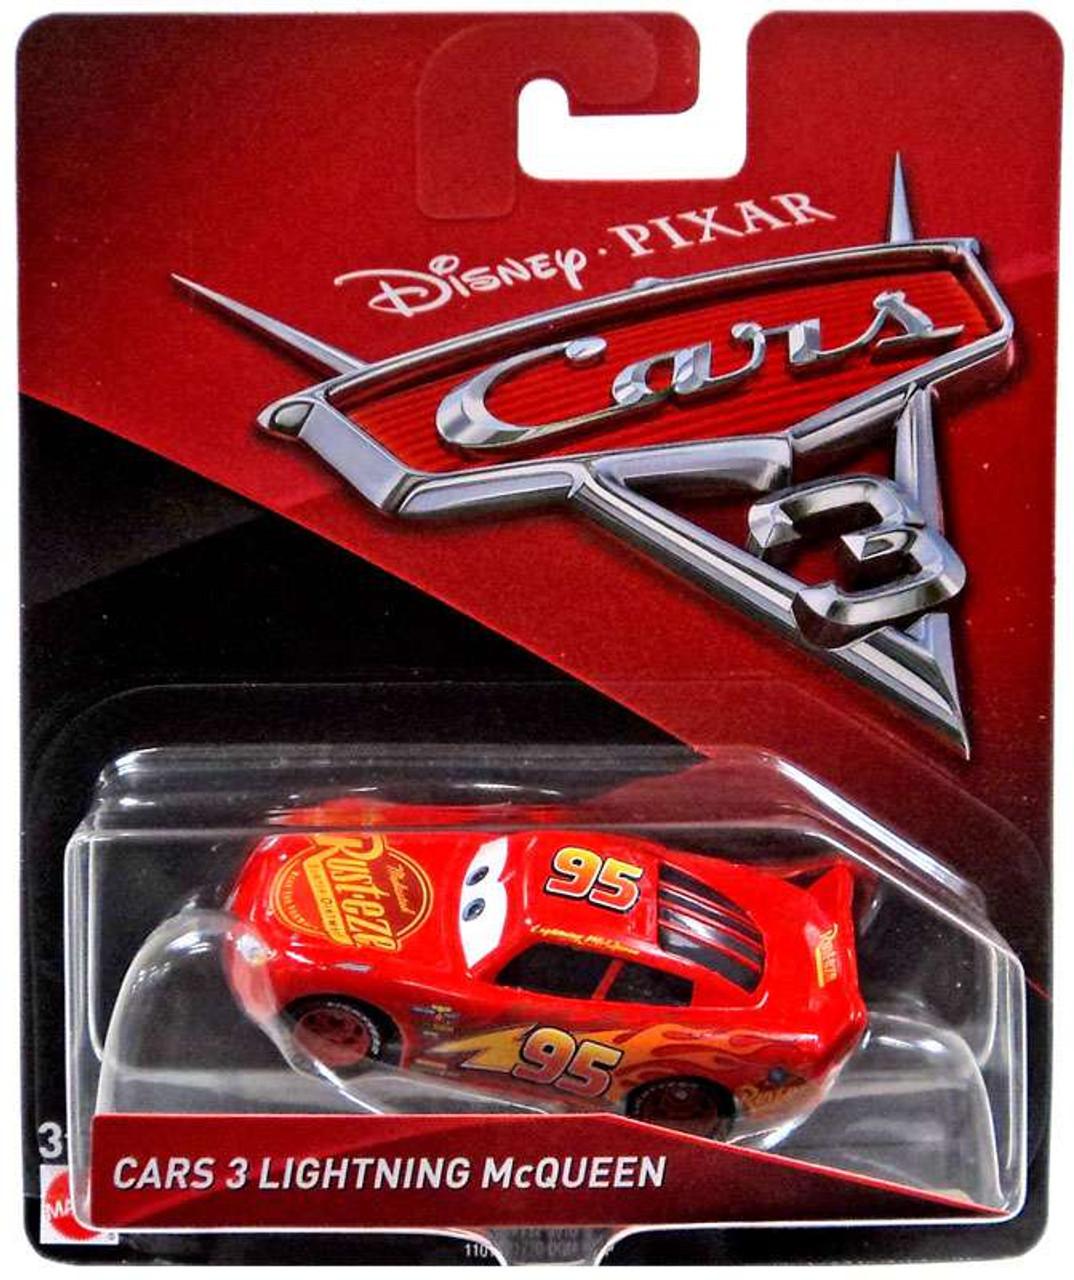 8549c91870c Disney Pixar Cars Cars 3 Lightning McQueen 155 Diecast Car Mattel Toys -  ToyWiz